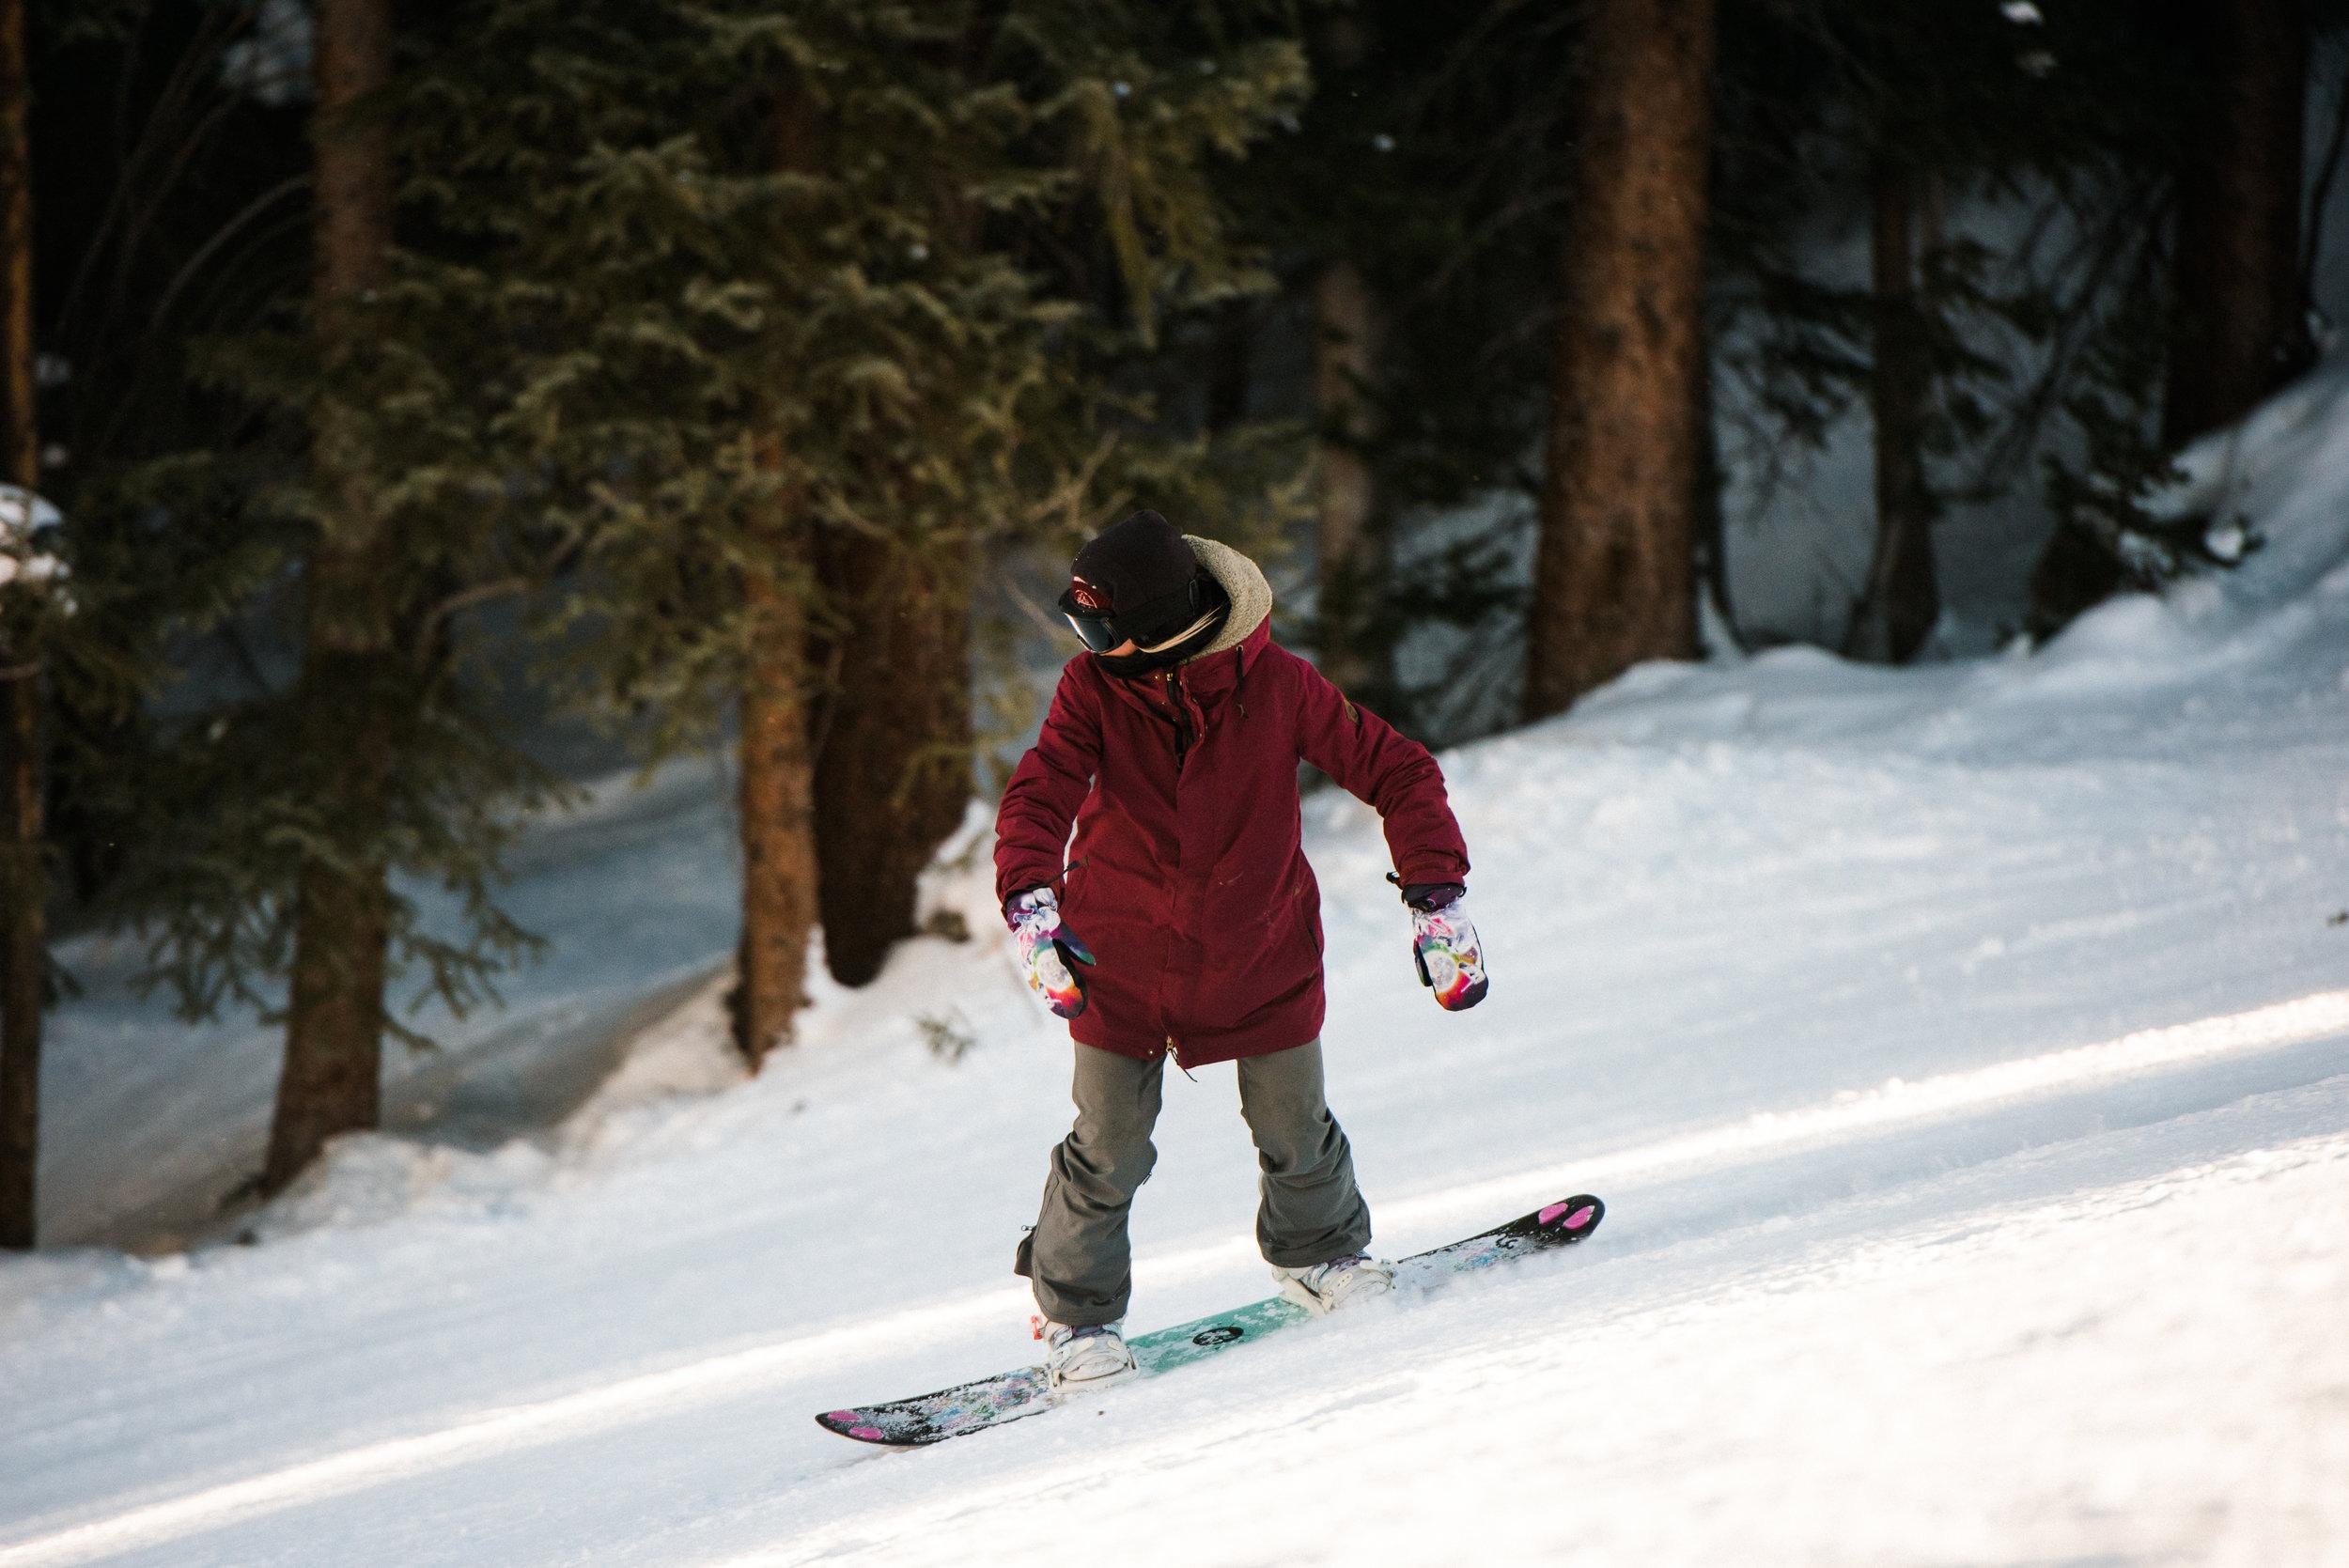 TaraShupe_Outdoor_Photographer_Loweprobags_Colorado_Copper_Mountains_Ski_53.jpg